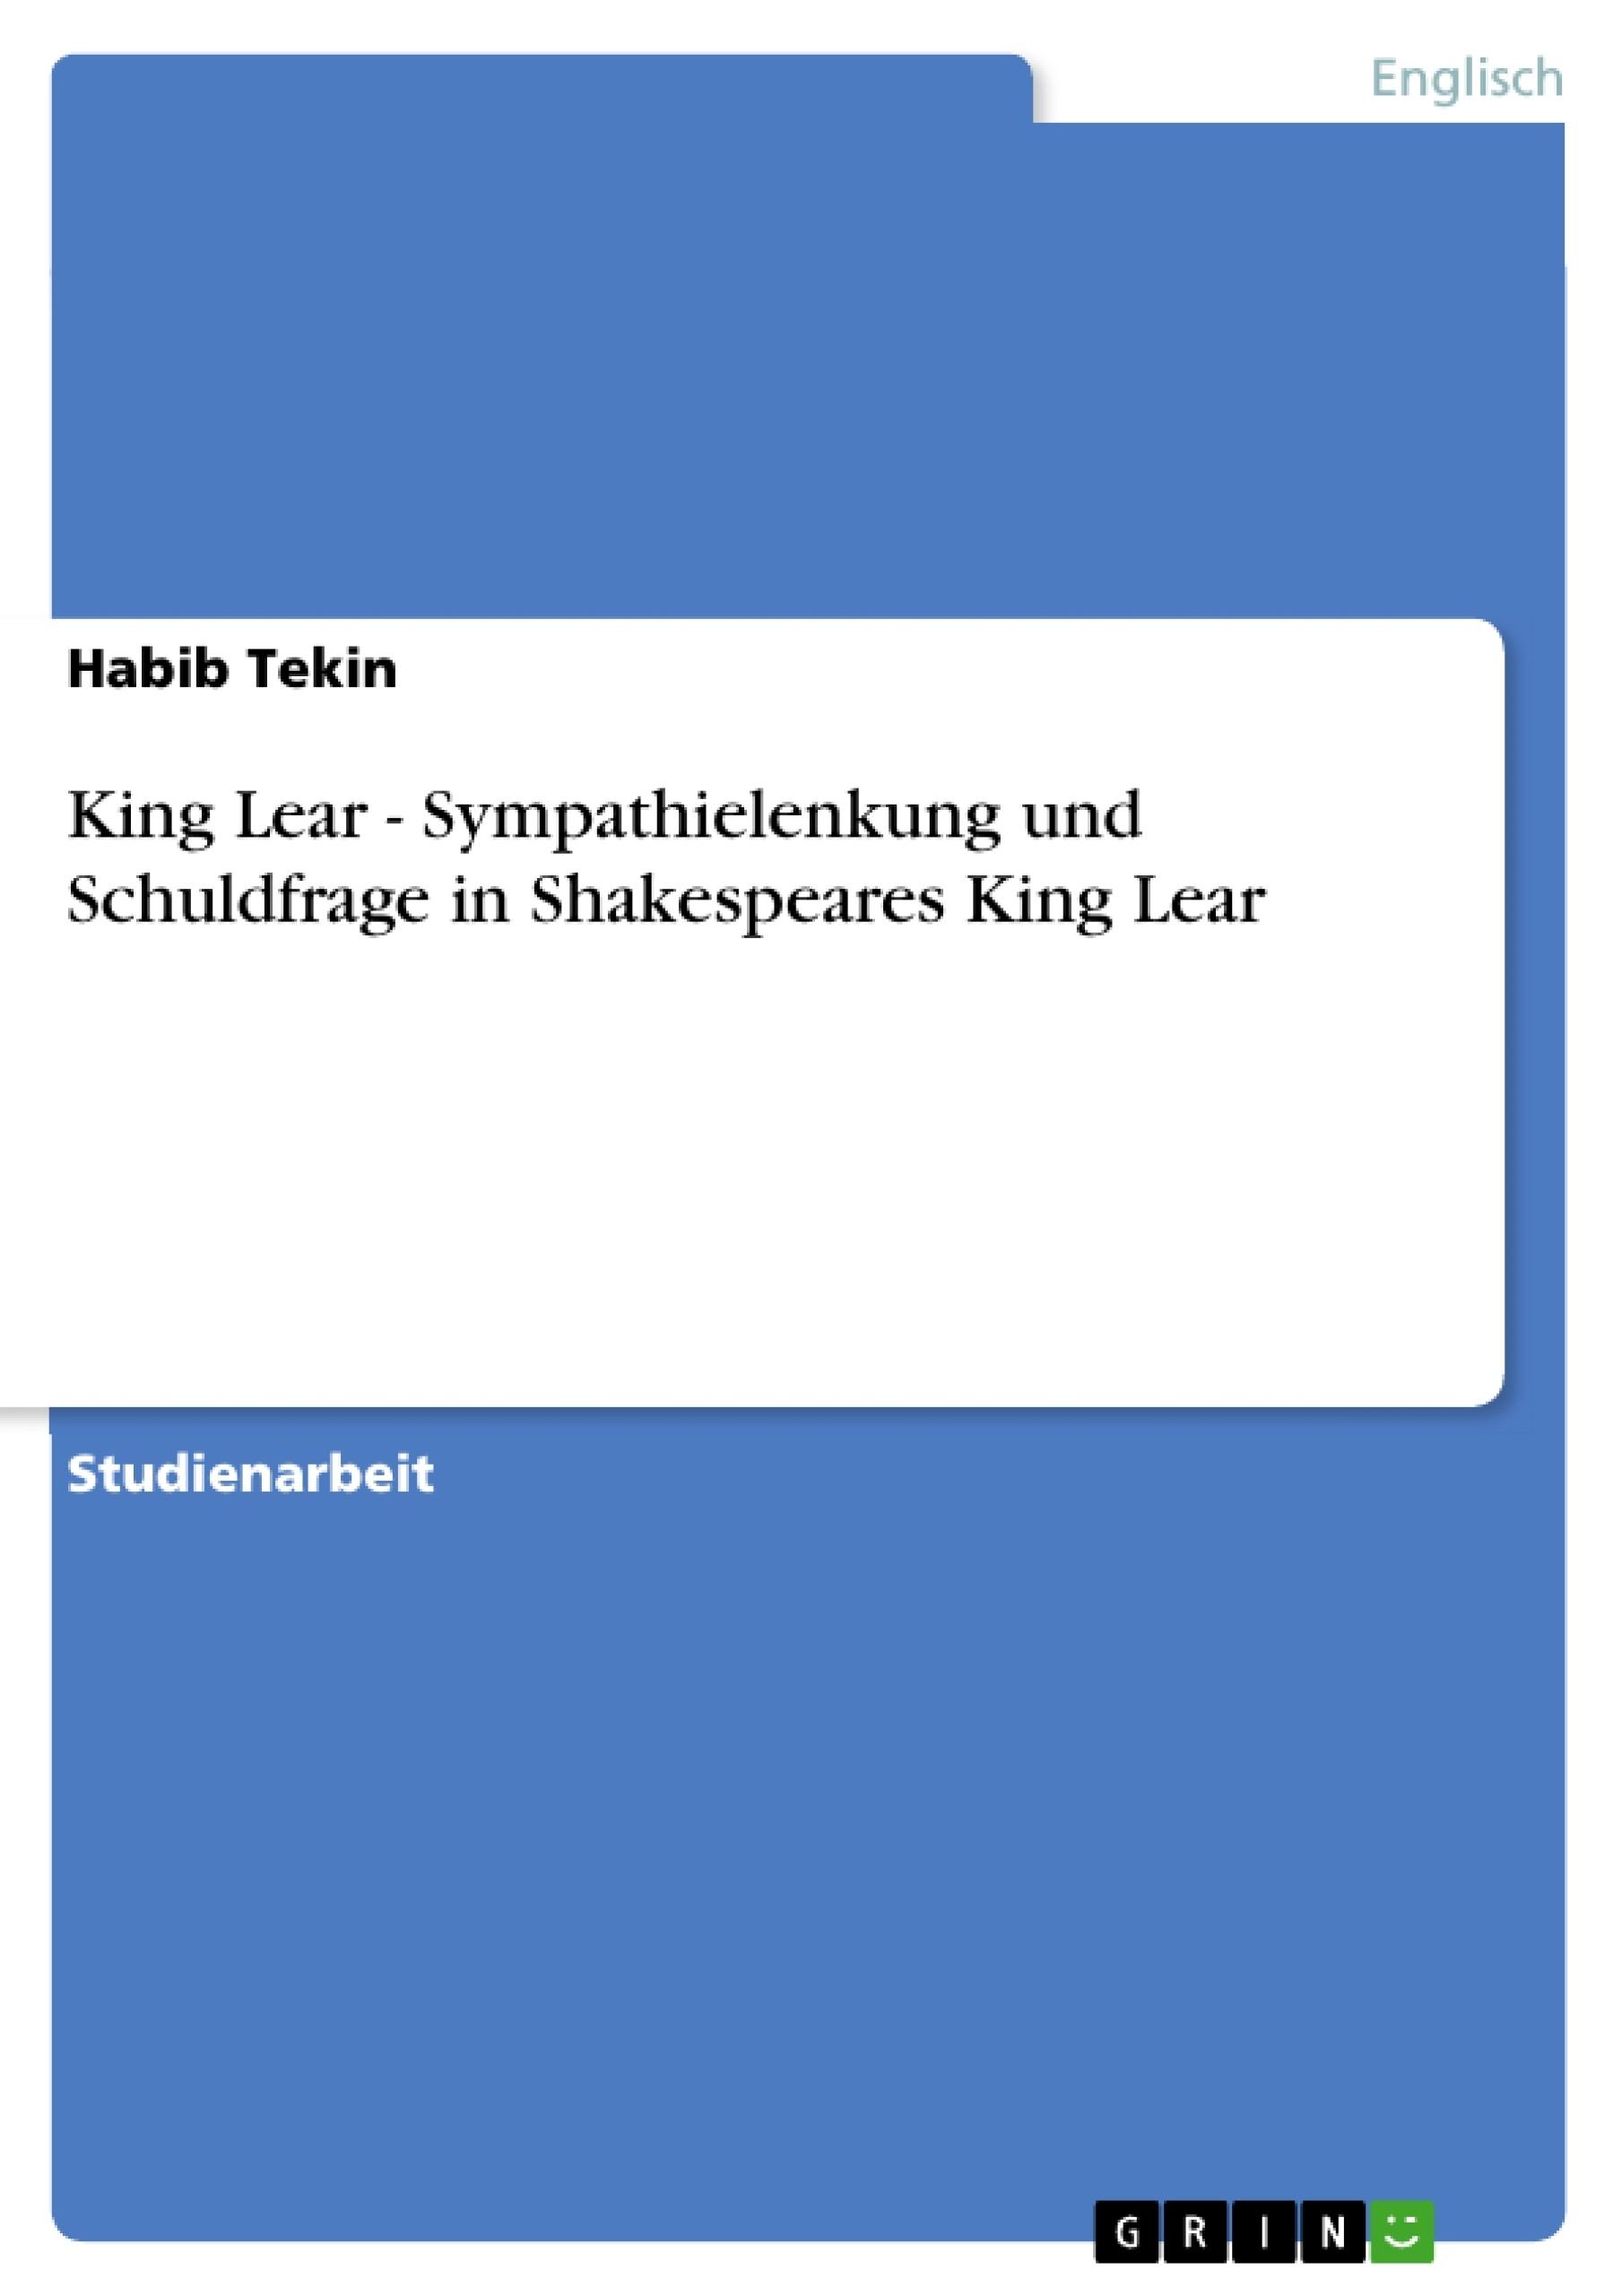 Titel: King Lear - Sympathielenkung und Schuldfrage in Shakespeares King Lear